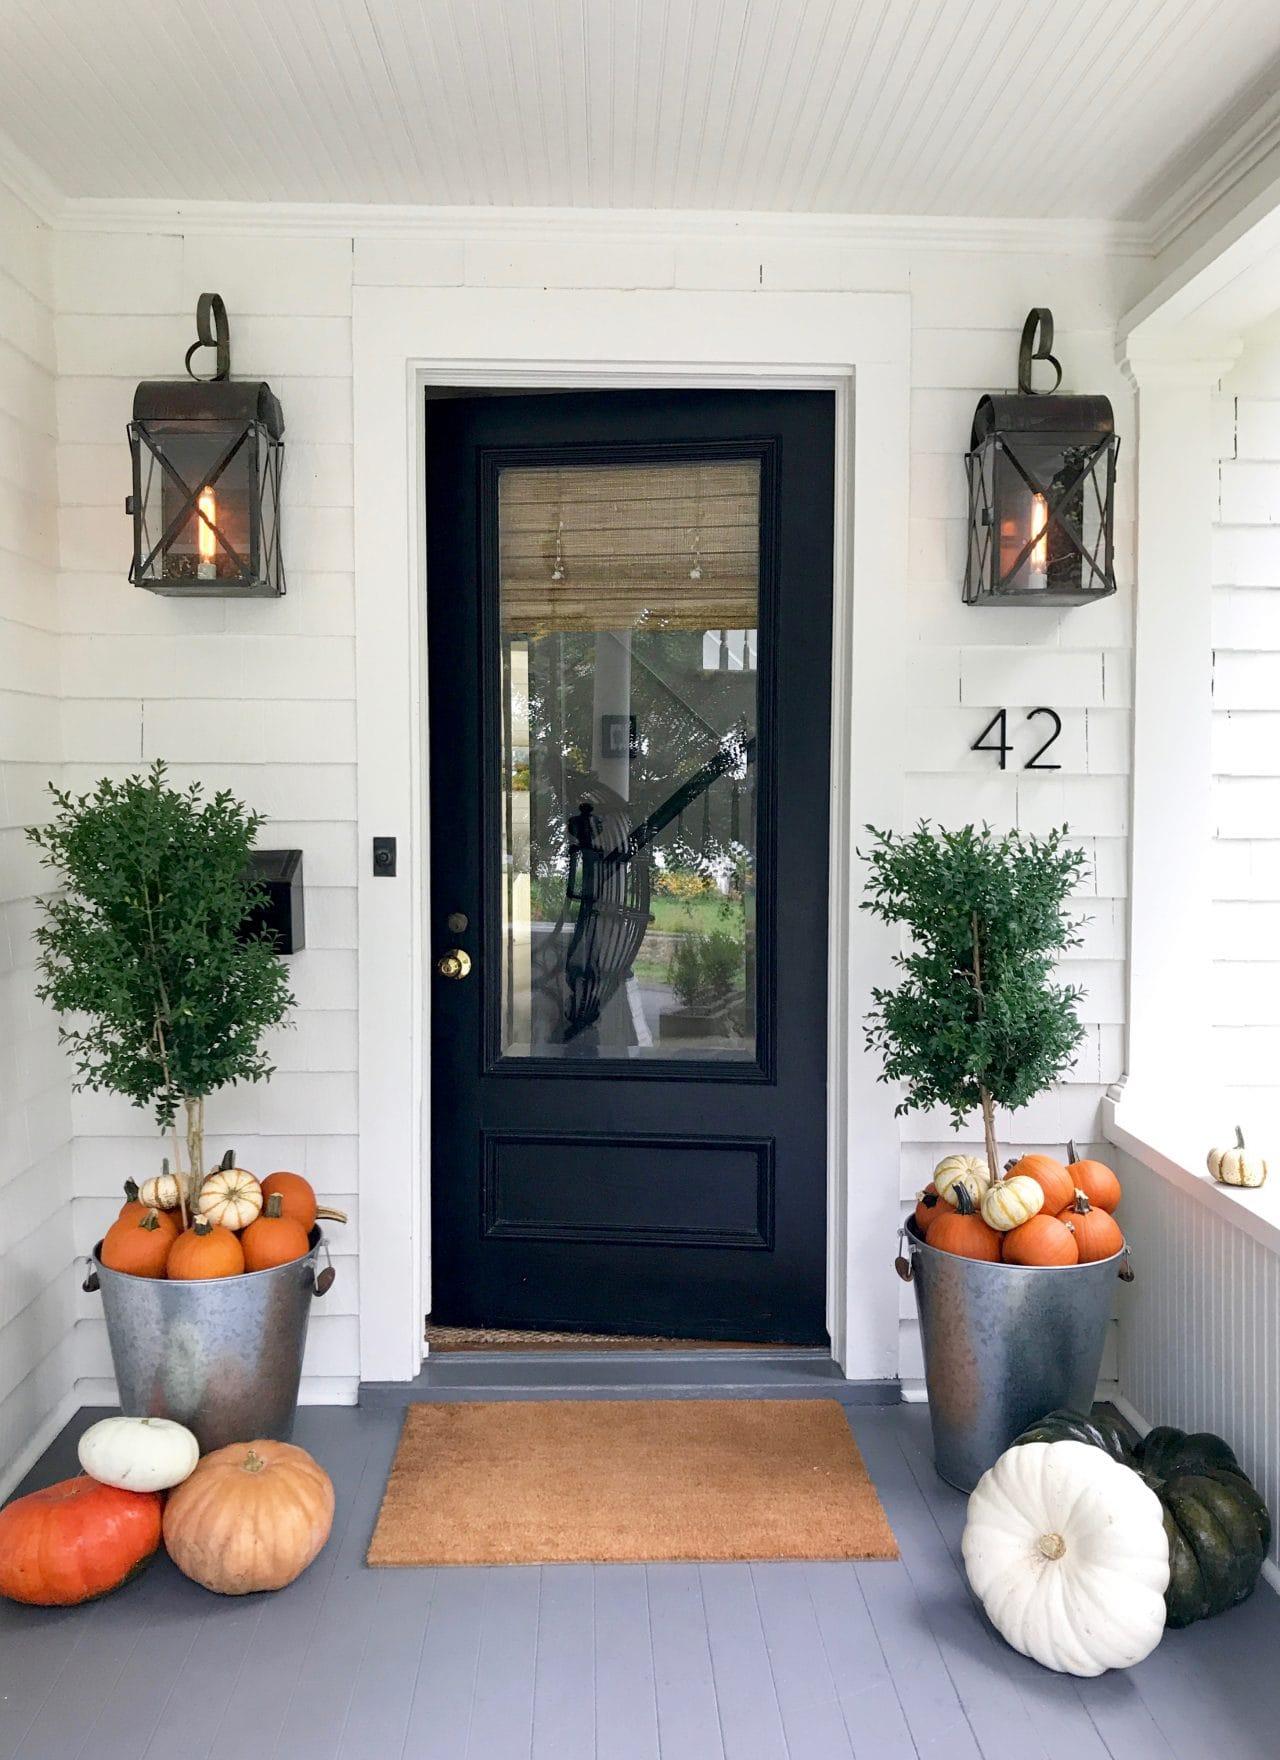 Pumpkins-galvanized-pots-front-porch-Halloween-white-cottage